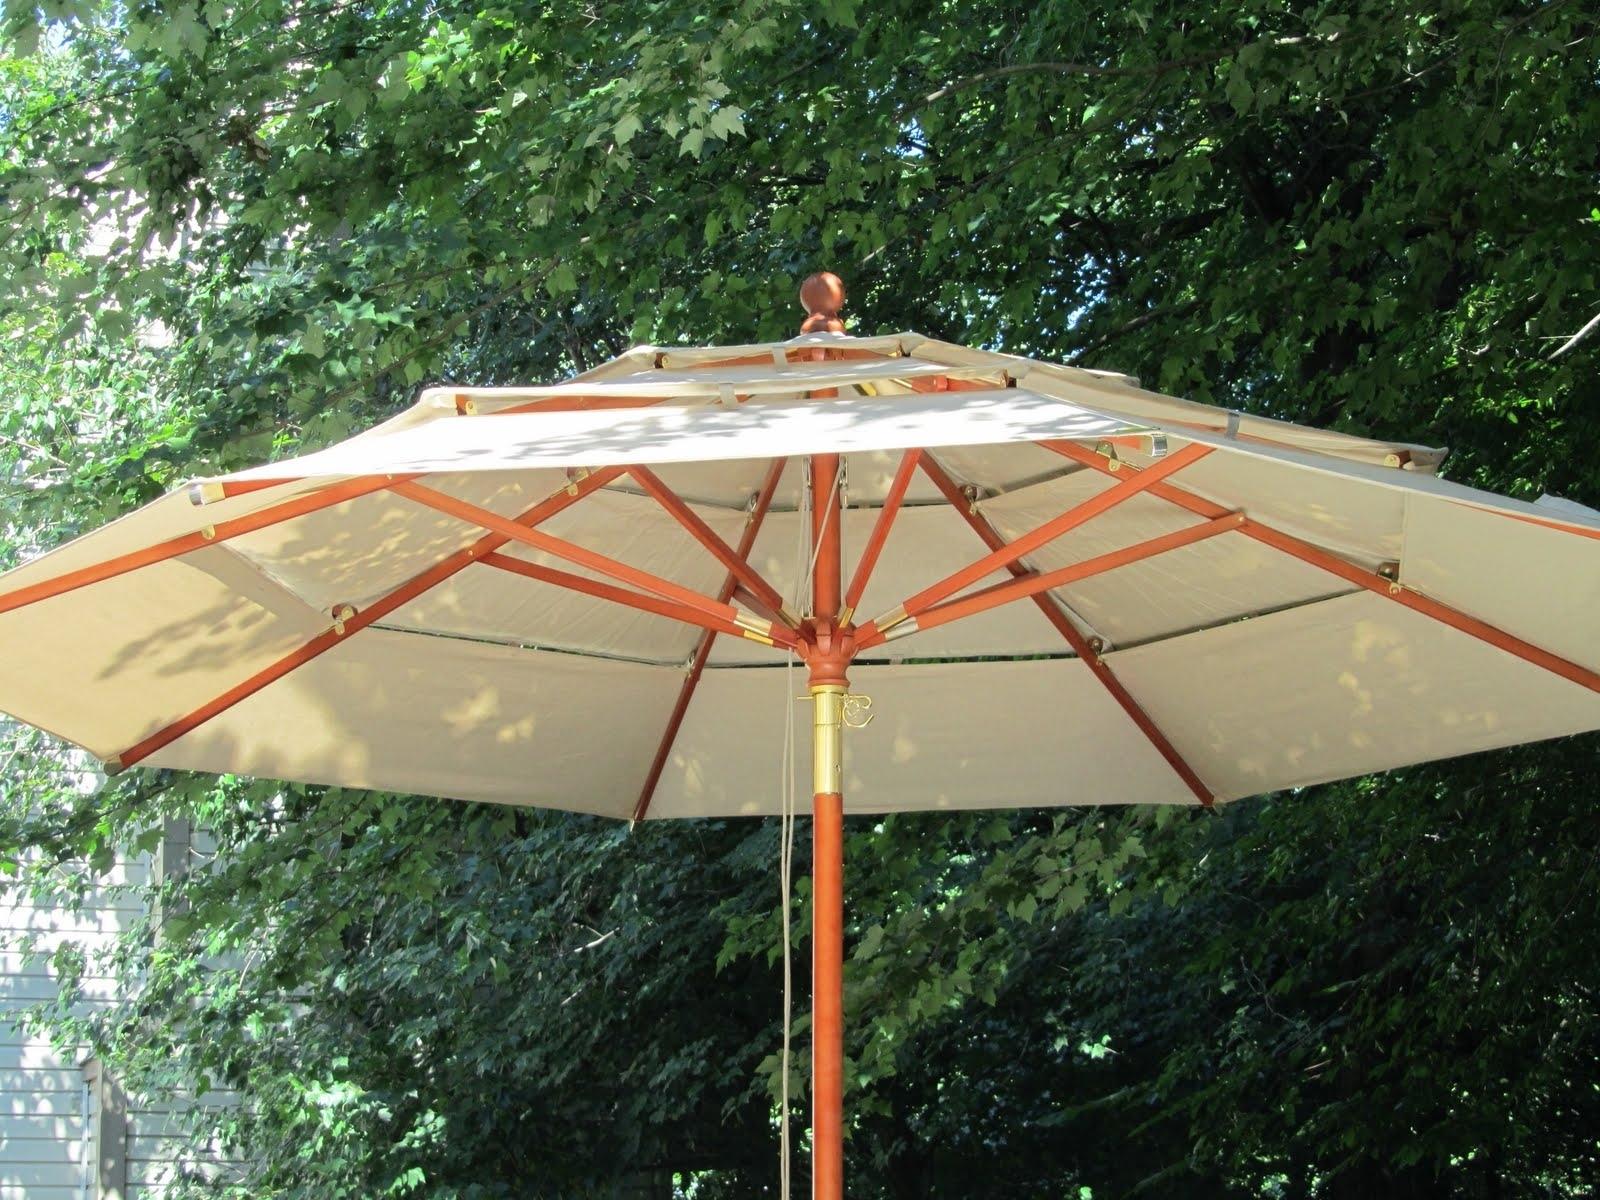 Extra Large Patio Umbrellas Throughout Preferred Garden: Enchanting Outdoor Patio Decor Ideas With Patio Umbrellas (View 16 of 20)